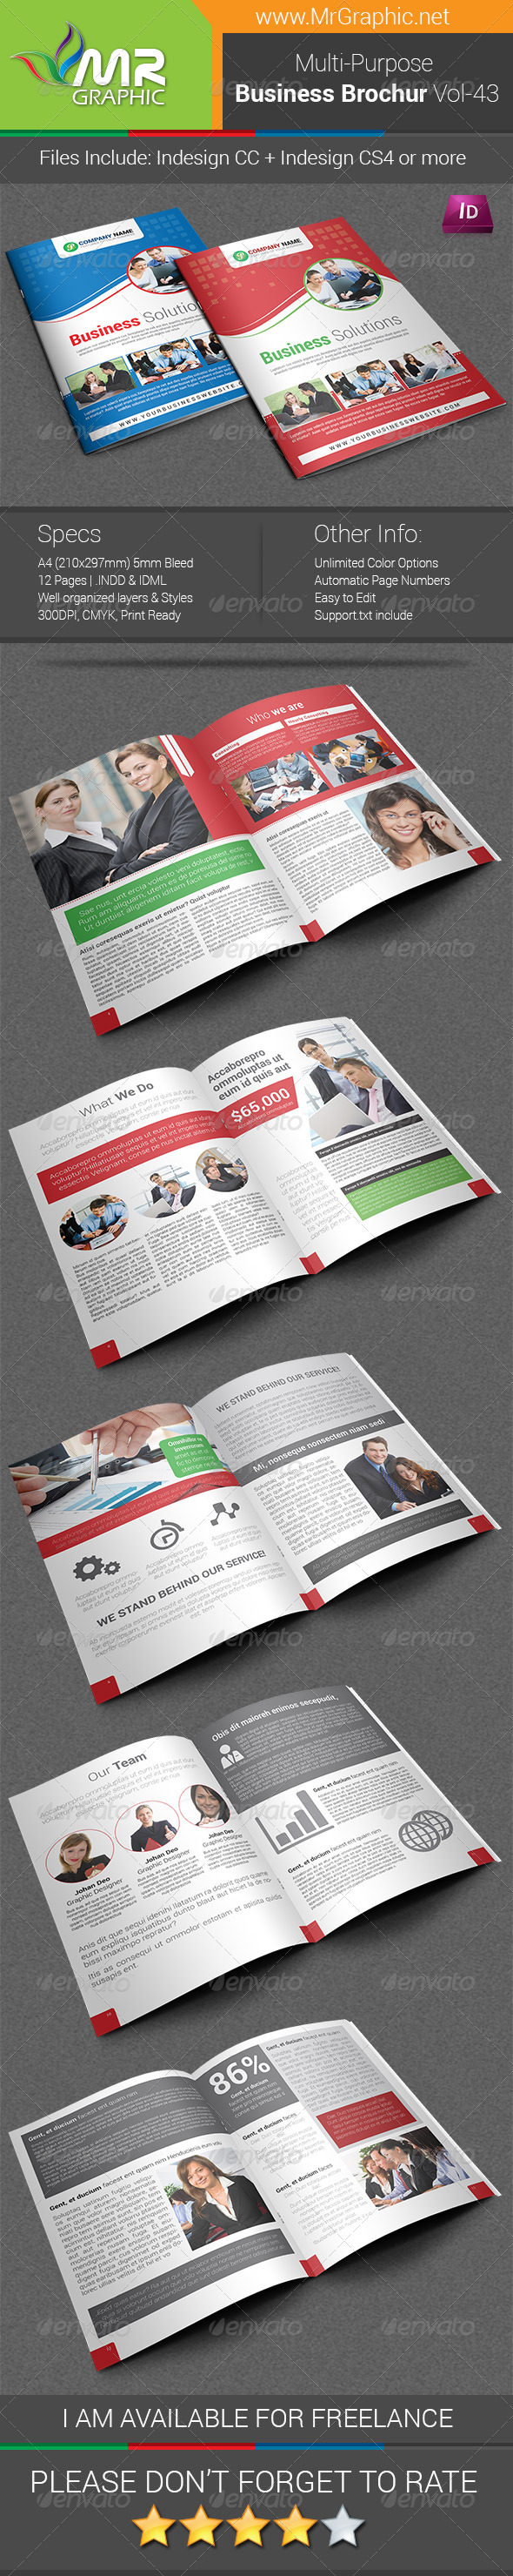 Multipurpose Business Brochure Template Vol-43